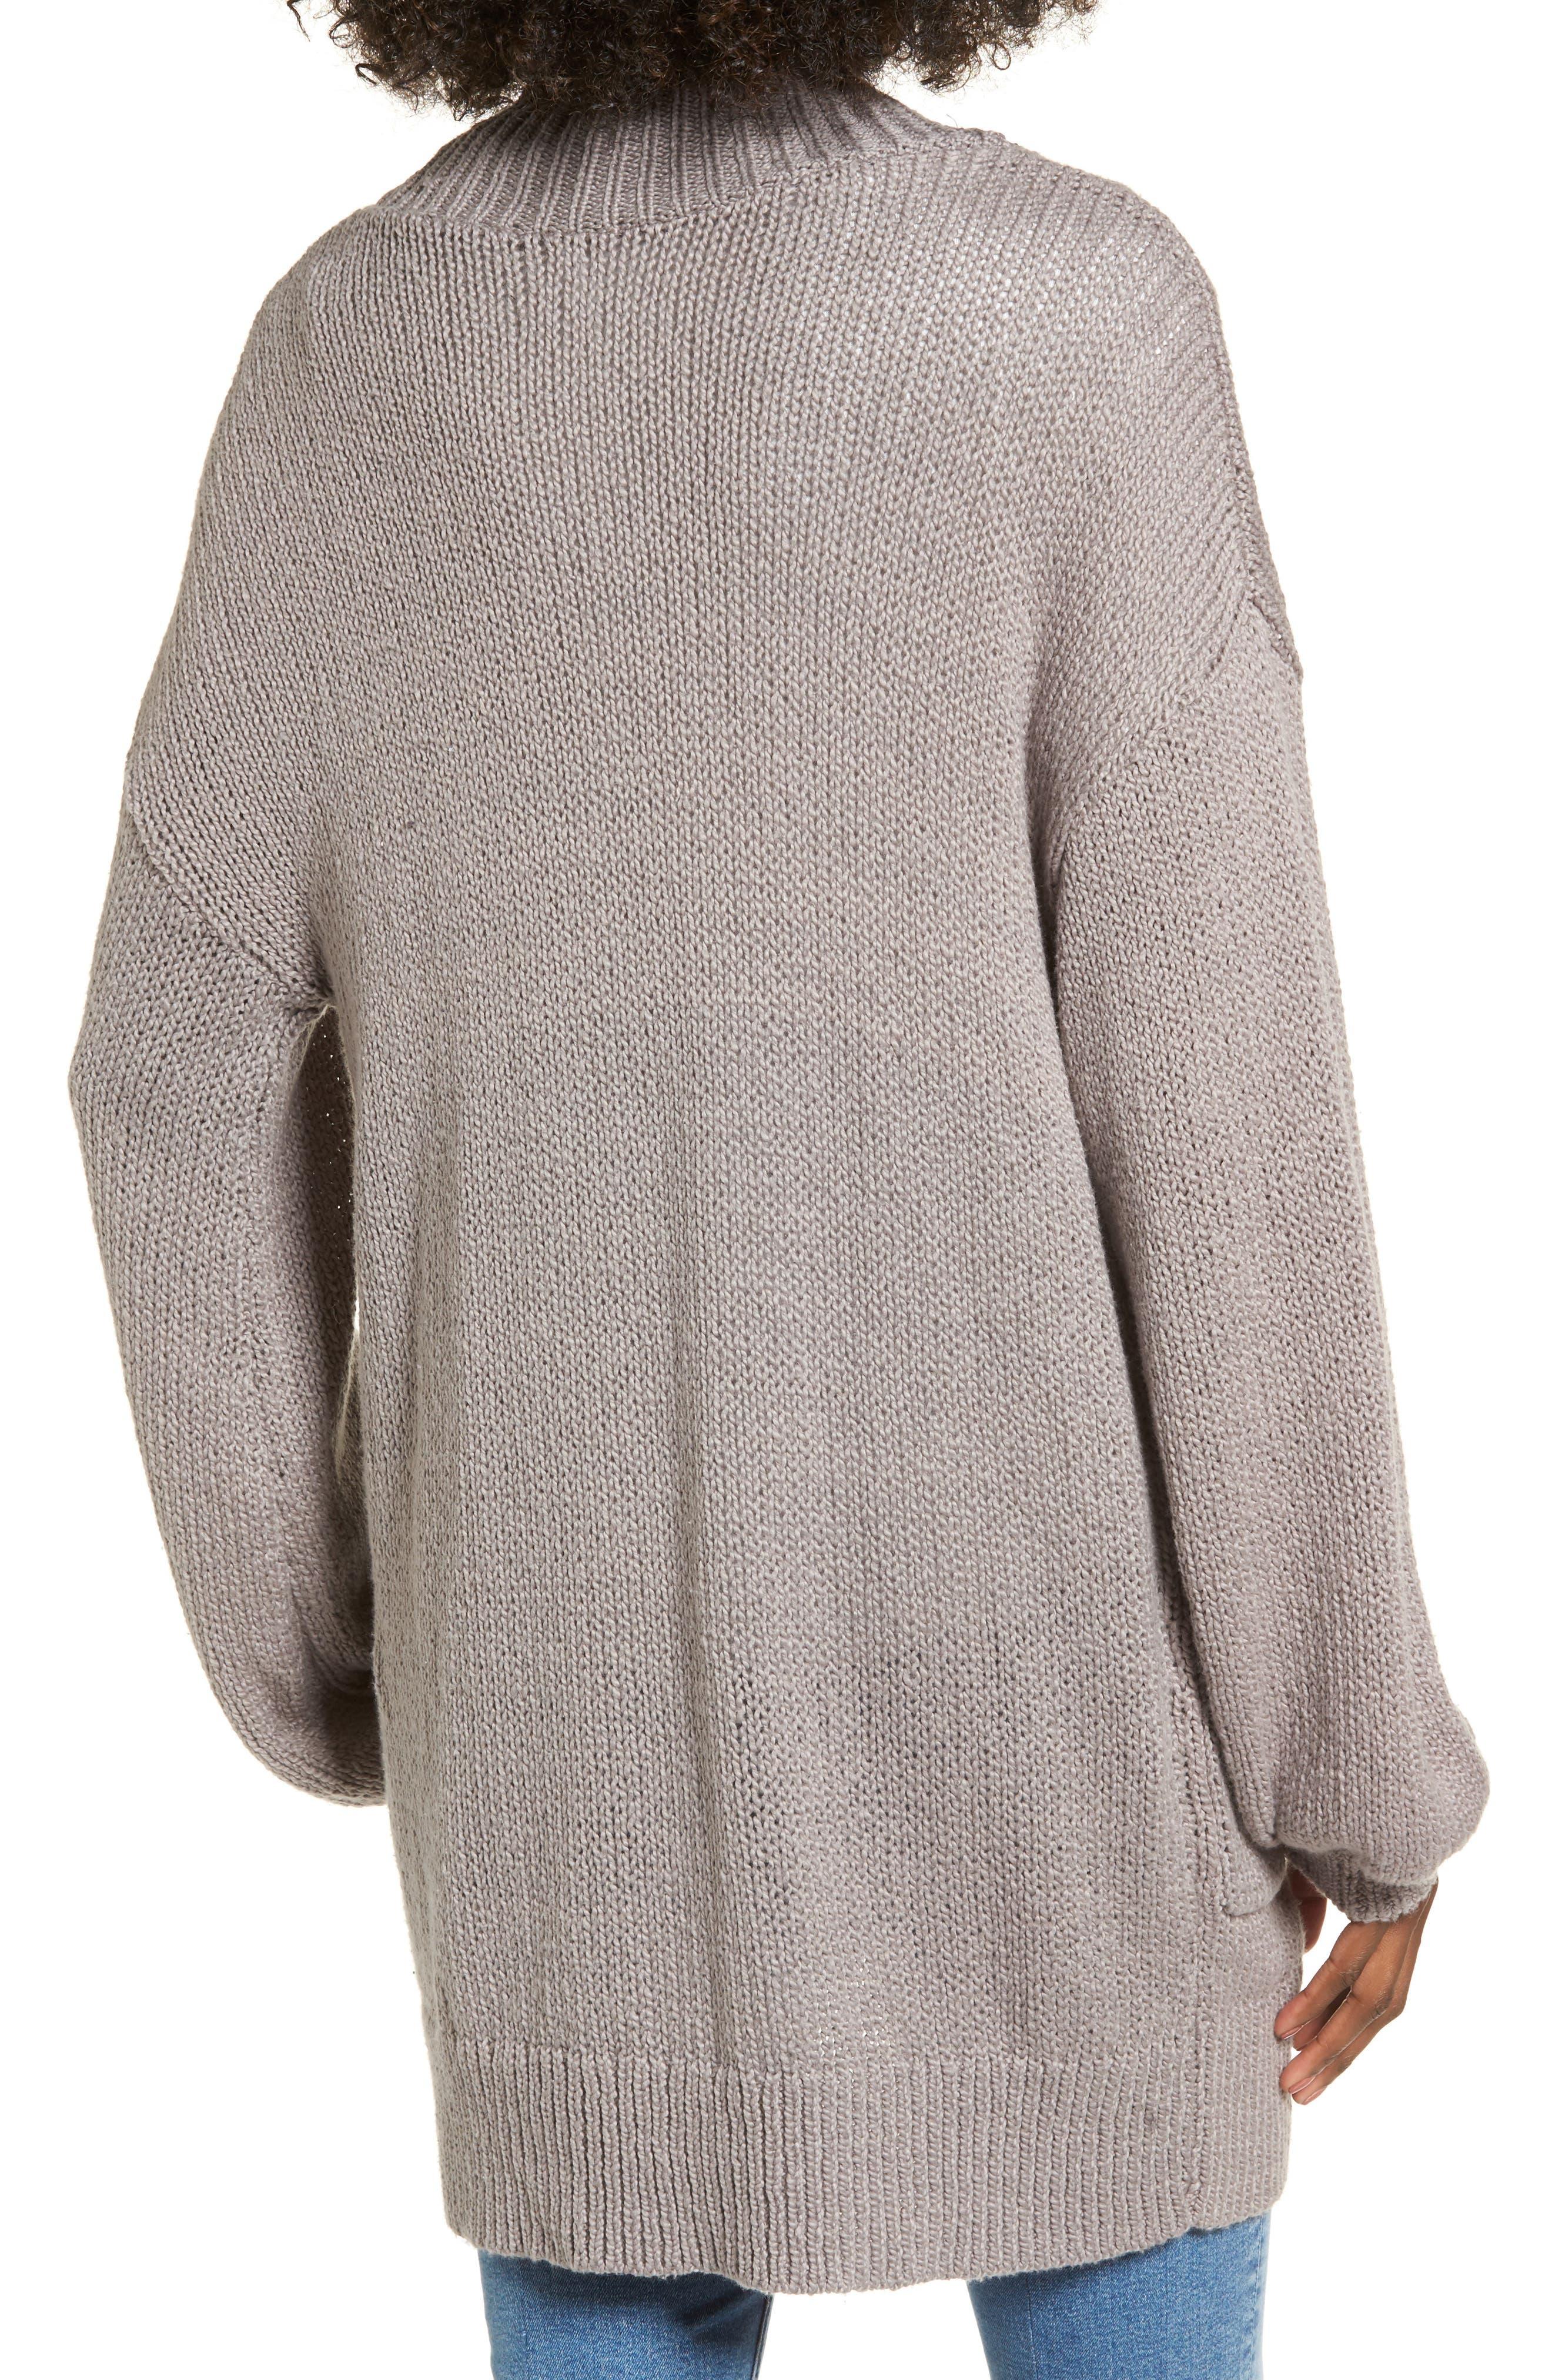 Blouson Sleeve Knit Cardigan,                             Alternate thumbnail 2, color,                             030